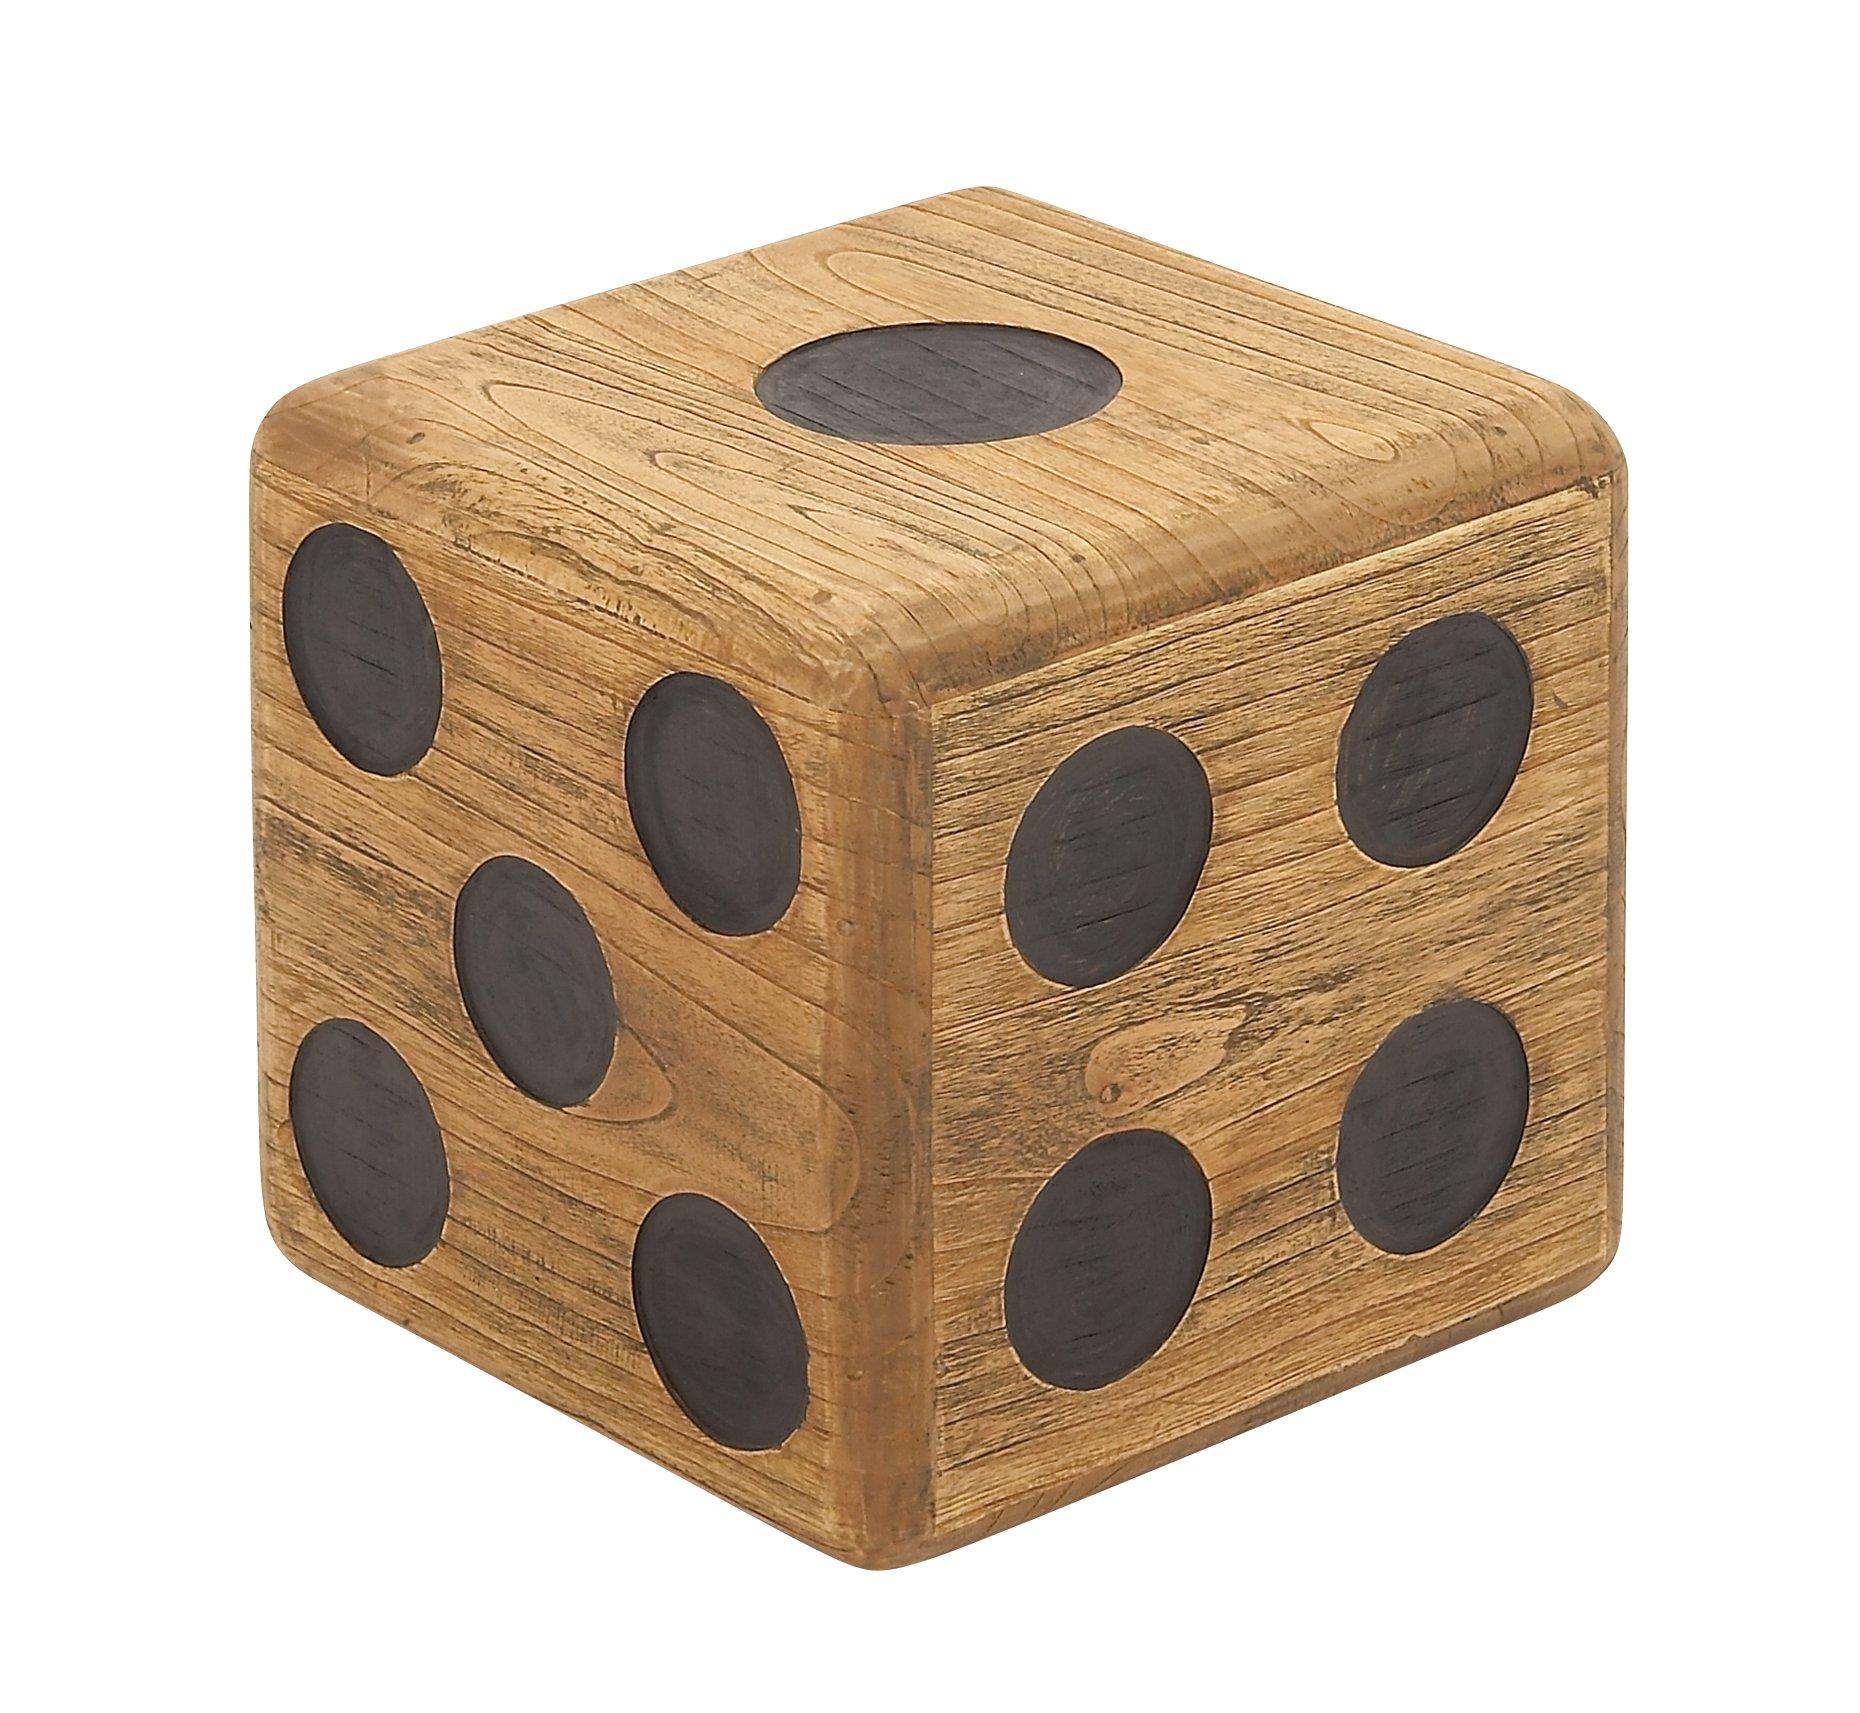 Deco 79 59205 Wood Teak Dice Stool, 16'' x 16''